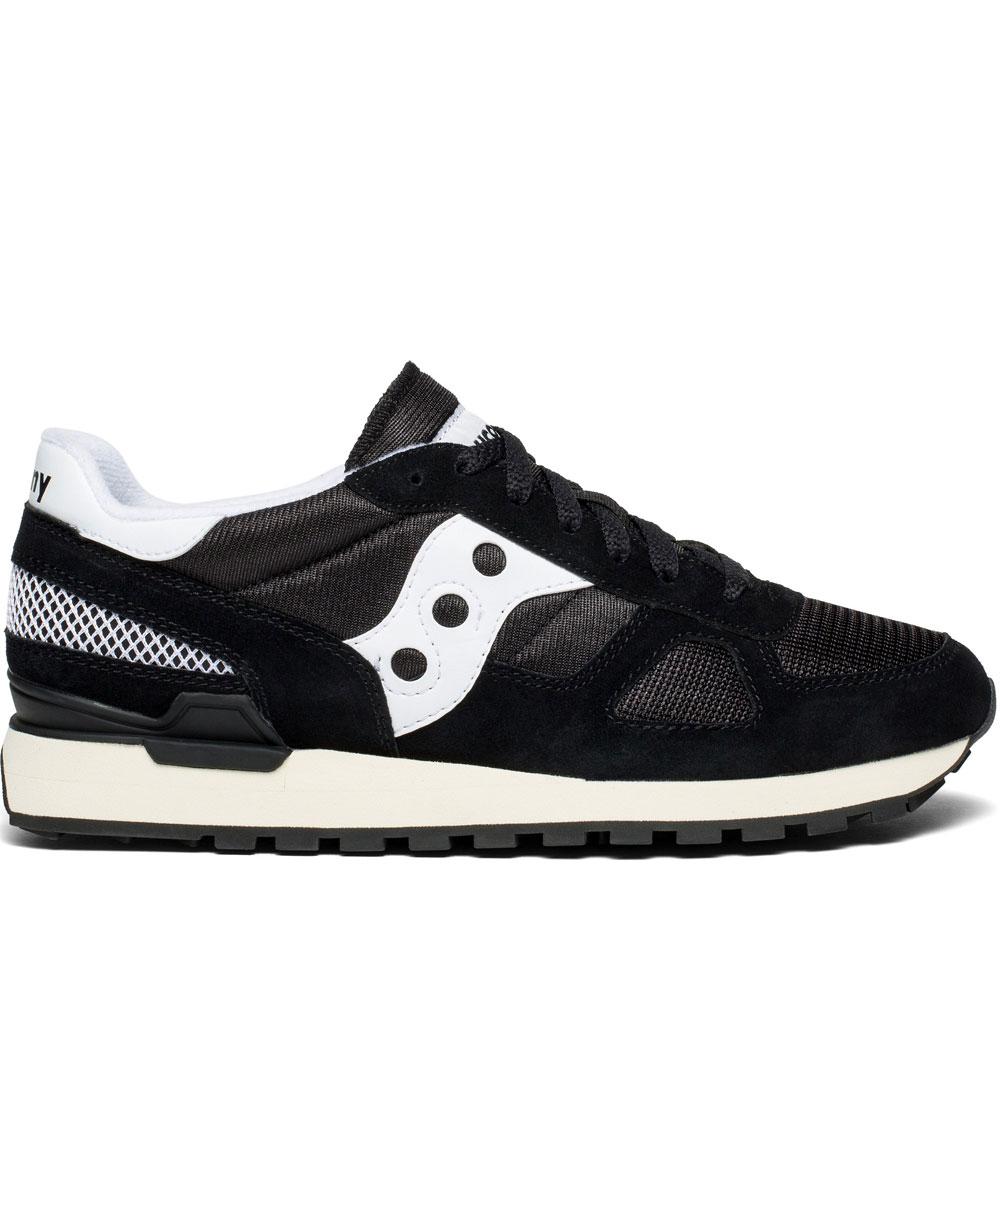 promo code 420c0 2f2bb Men's Shadow Original Vintage Sneakers Shoes Black/White